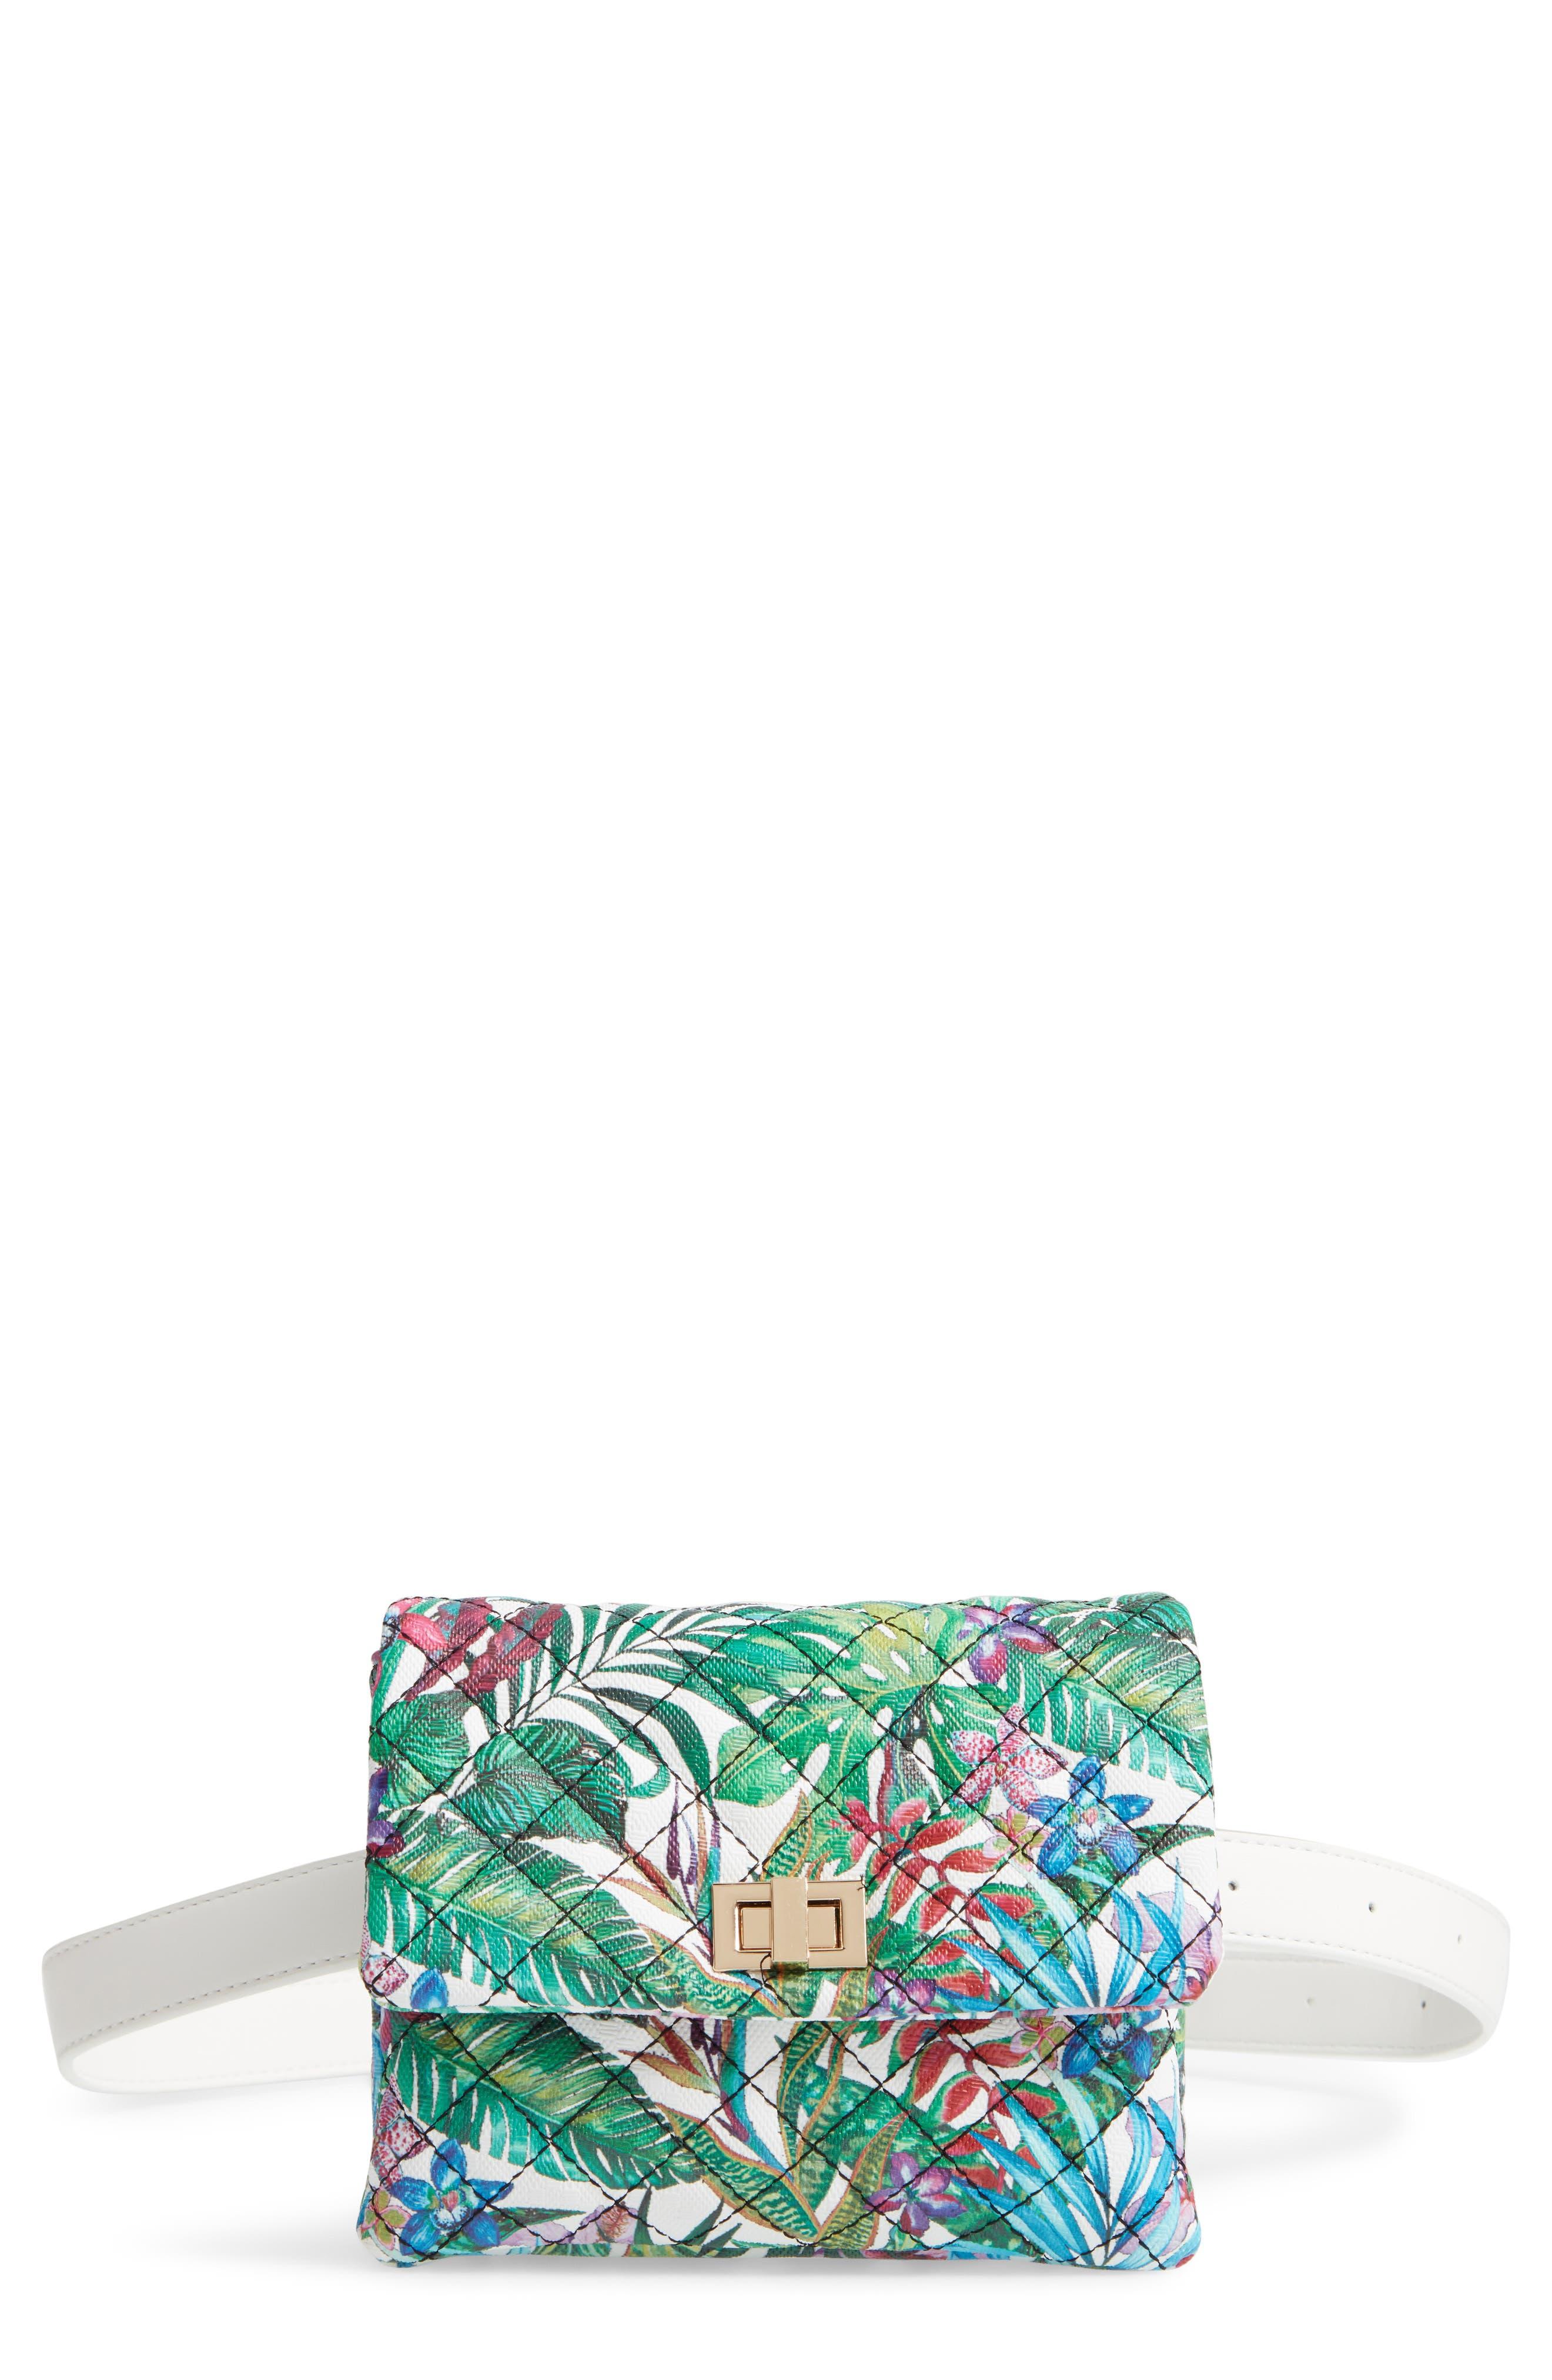 MALI + LILI, Quilted Vegan Leather Belt Bag, Main thumbnail 1, color, 101